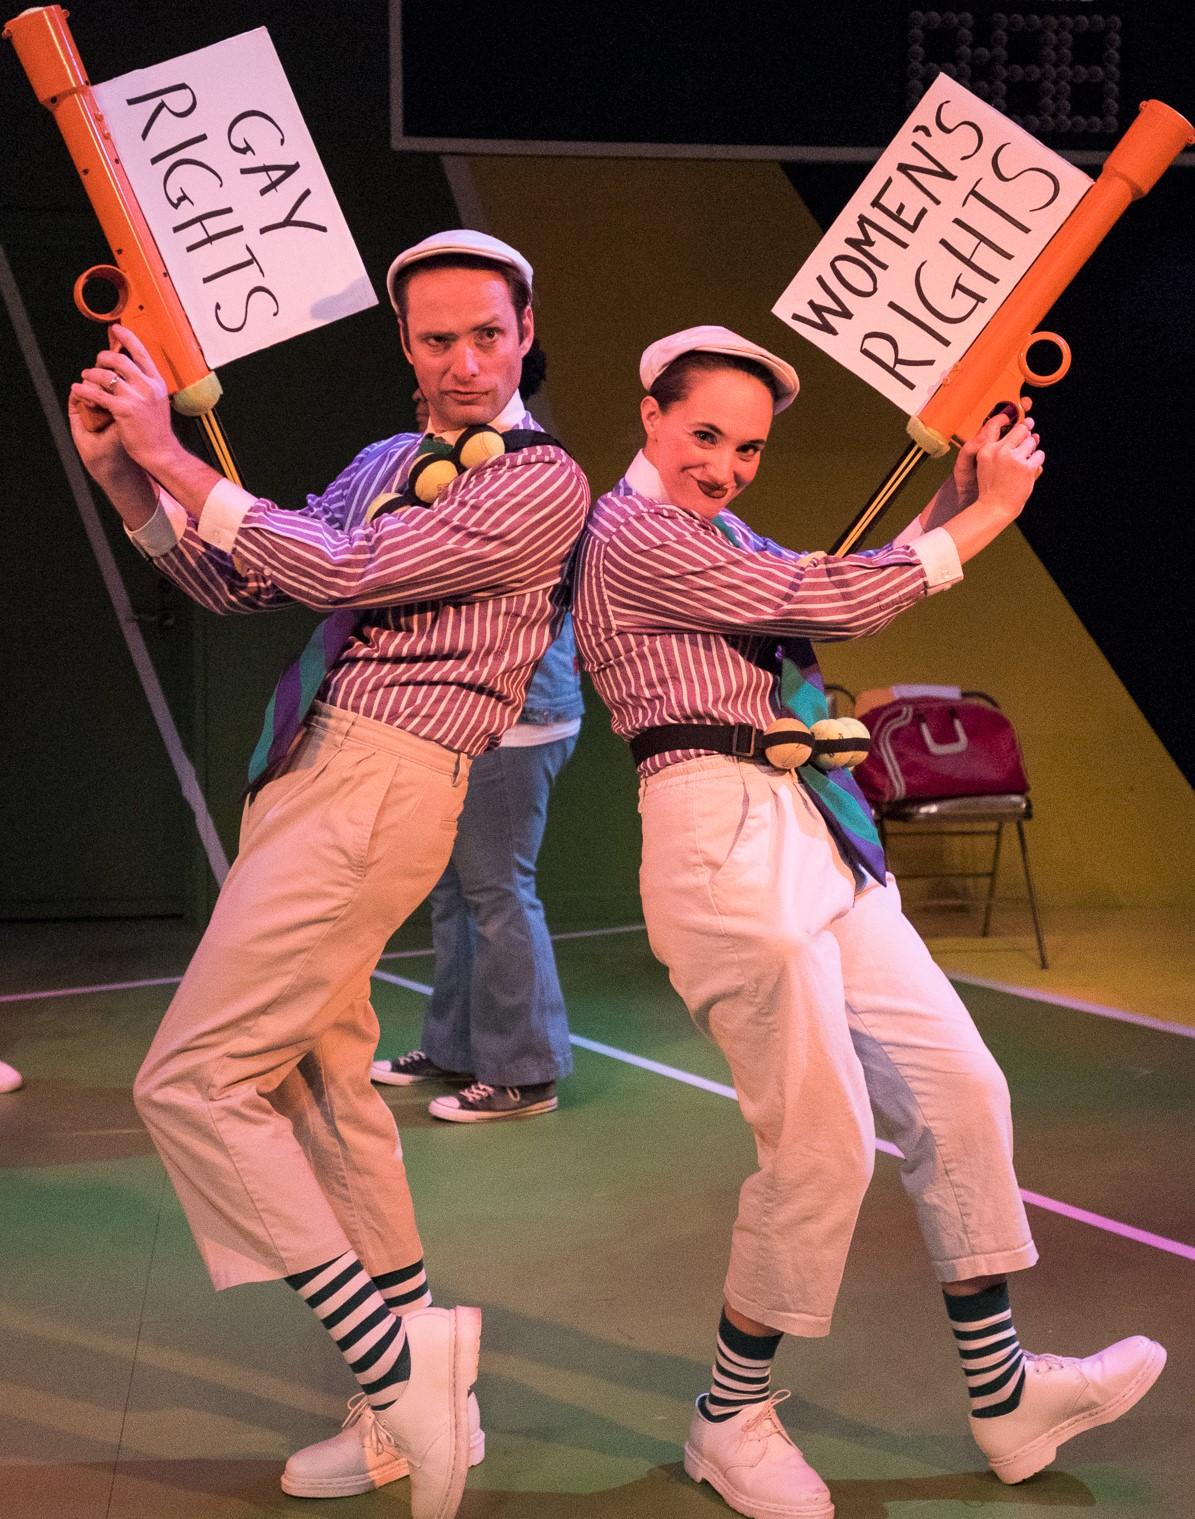 Richard Saudek as Clownboy and Olivia McGiff as Clowngirl. Photographs by Russ Rowland.